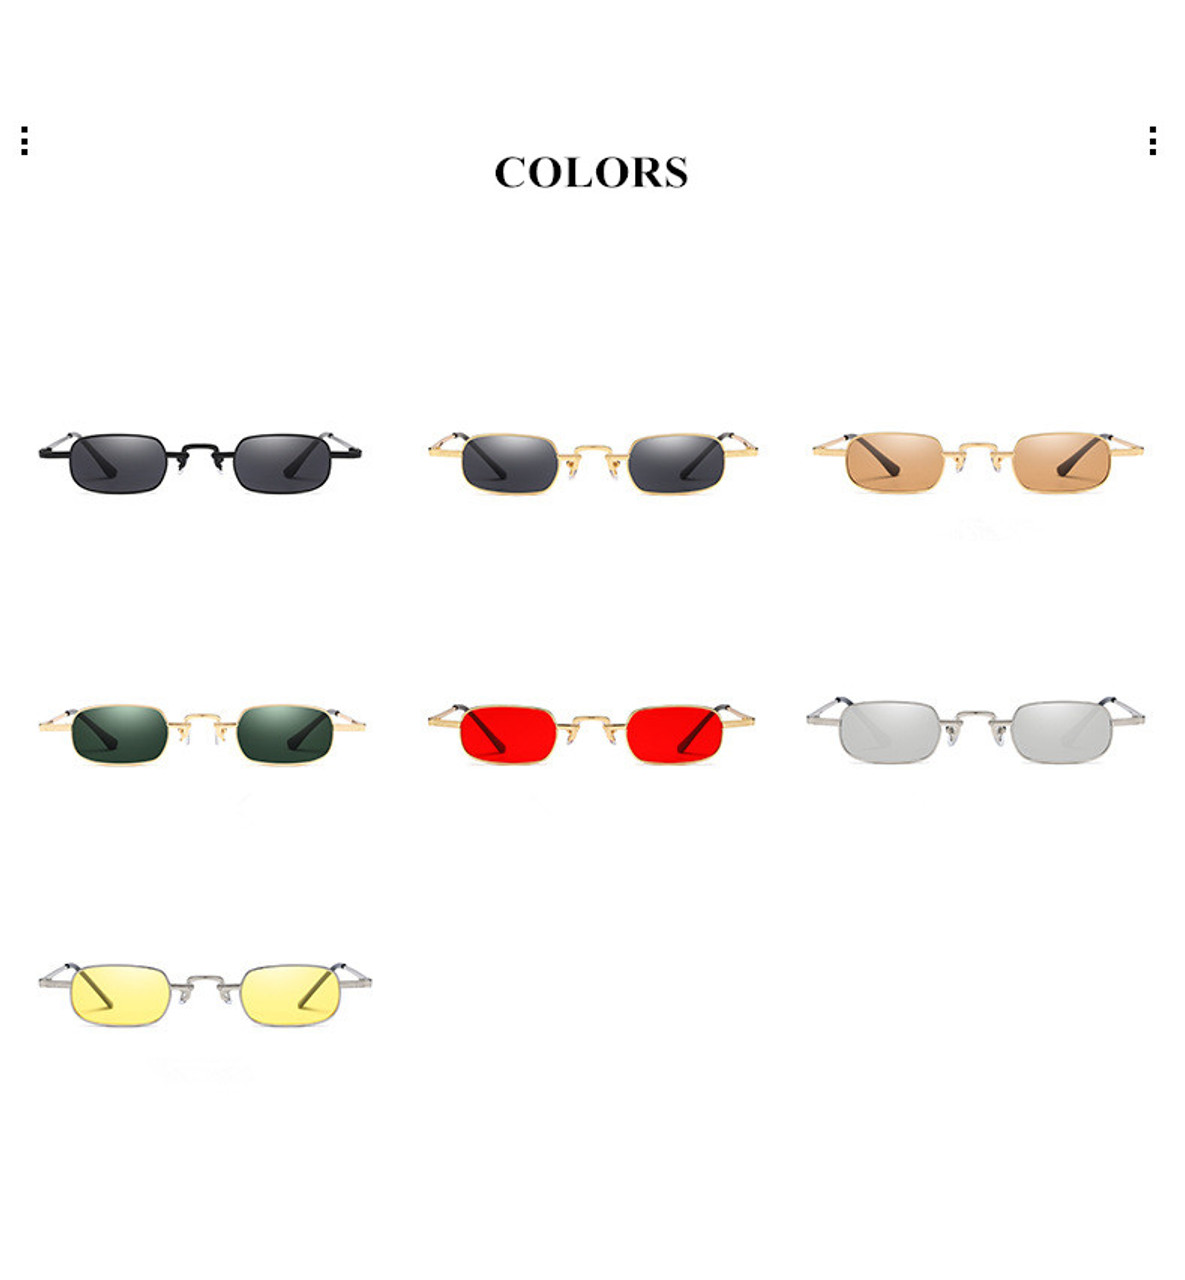 ef6e01c9b1bc ... VWKTUUN Metal Sunglasses Men Women Fashion Glasses Small Retro Vintage  Sunglasses UV400 Eyewear Sport Hip Hop ...